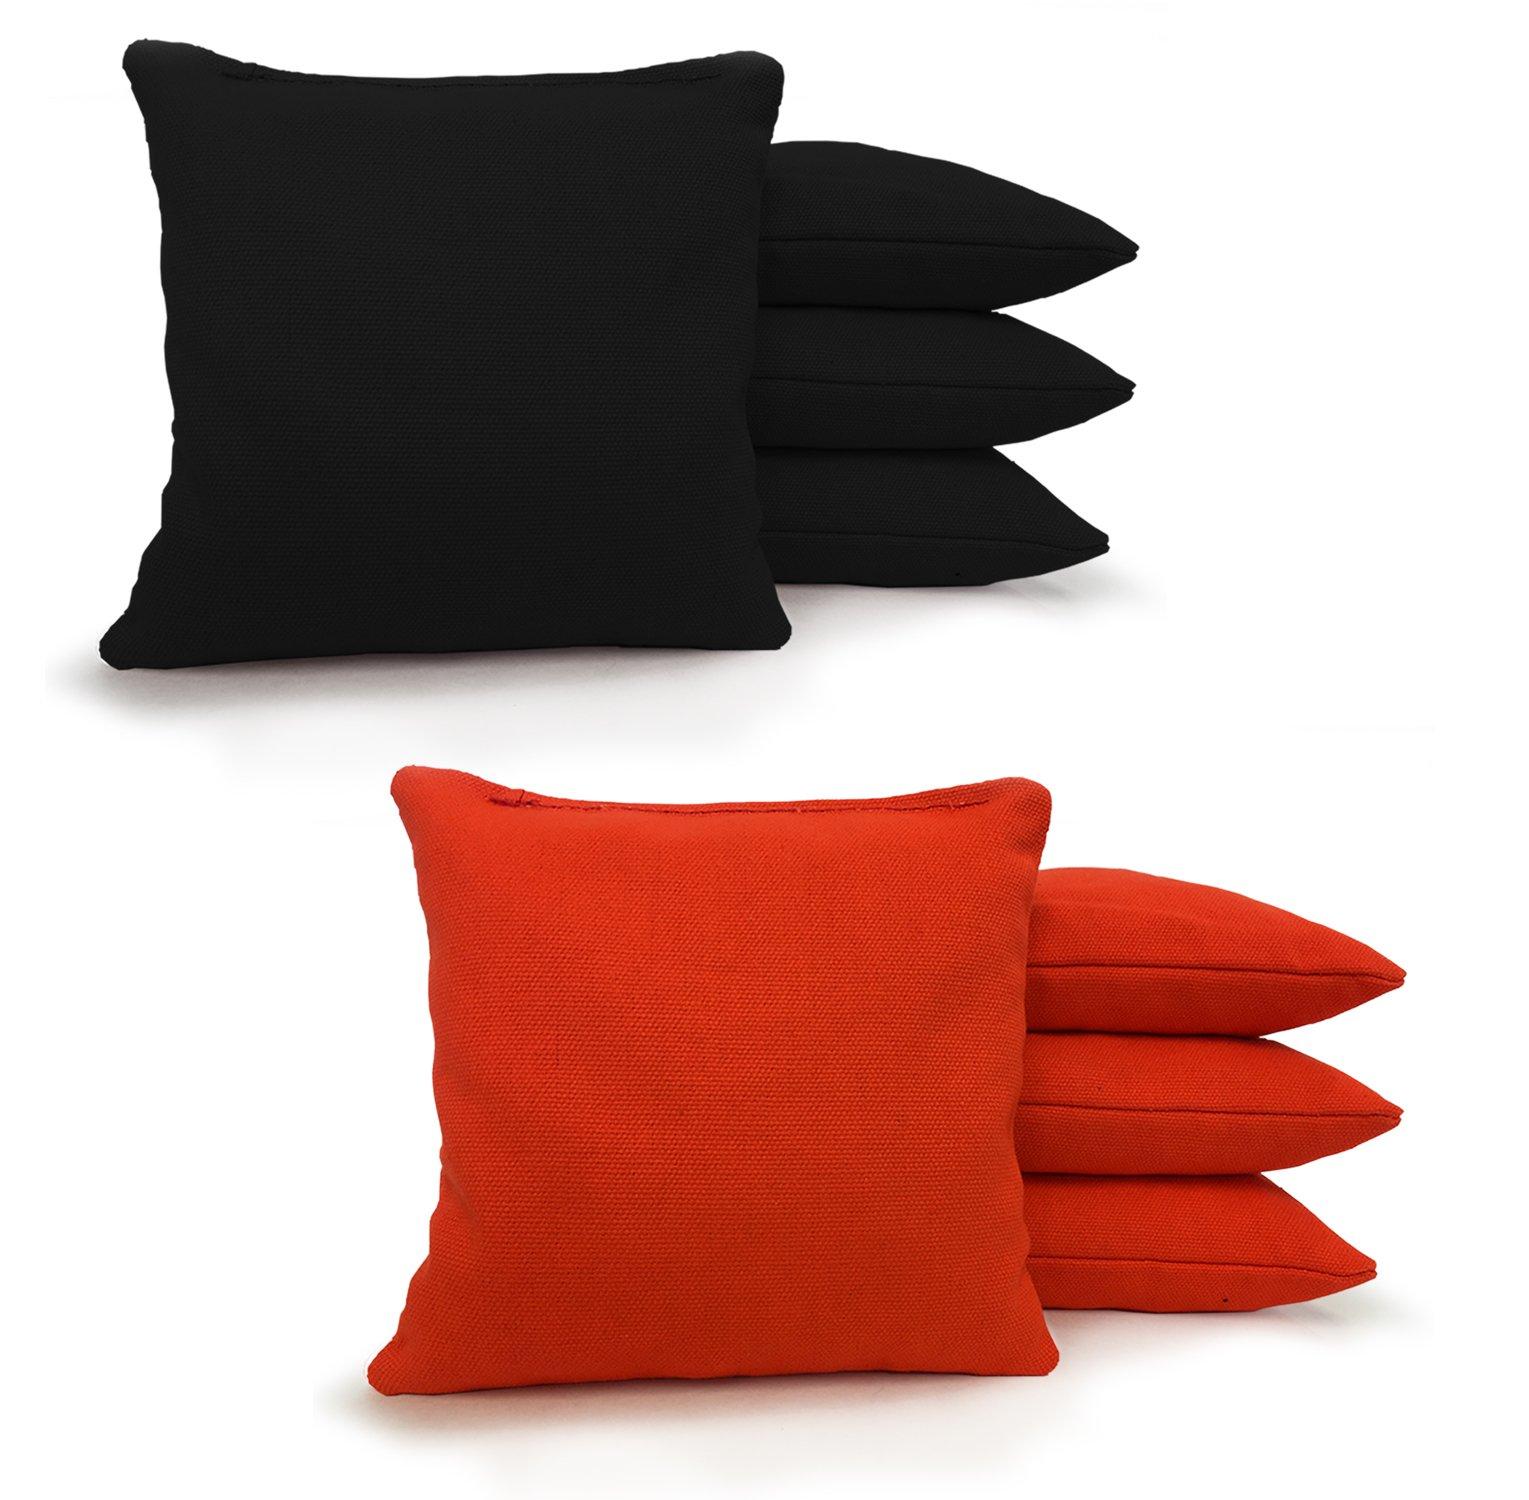 8 Standard Corn Filled Regulation 6''x6'' Duck Cloth Cornhole Bags! (Black/Orange)